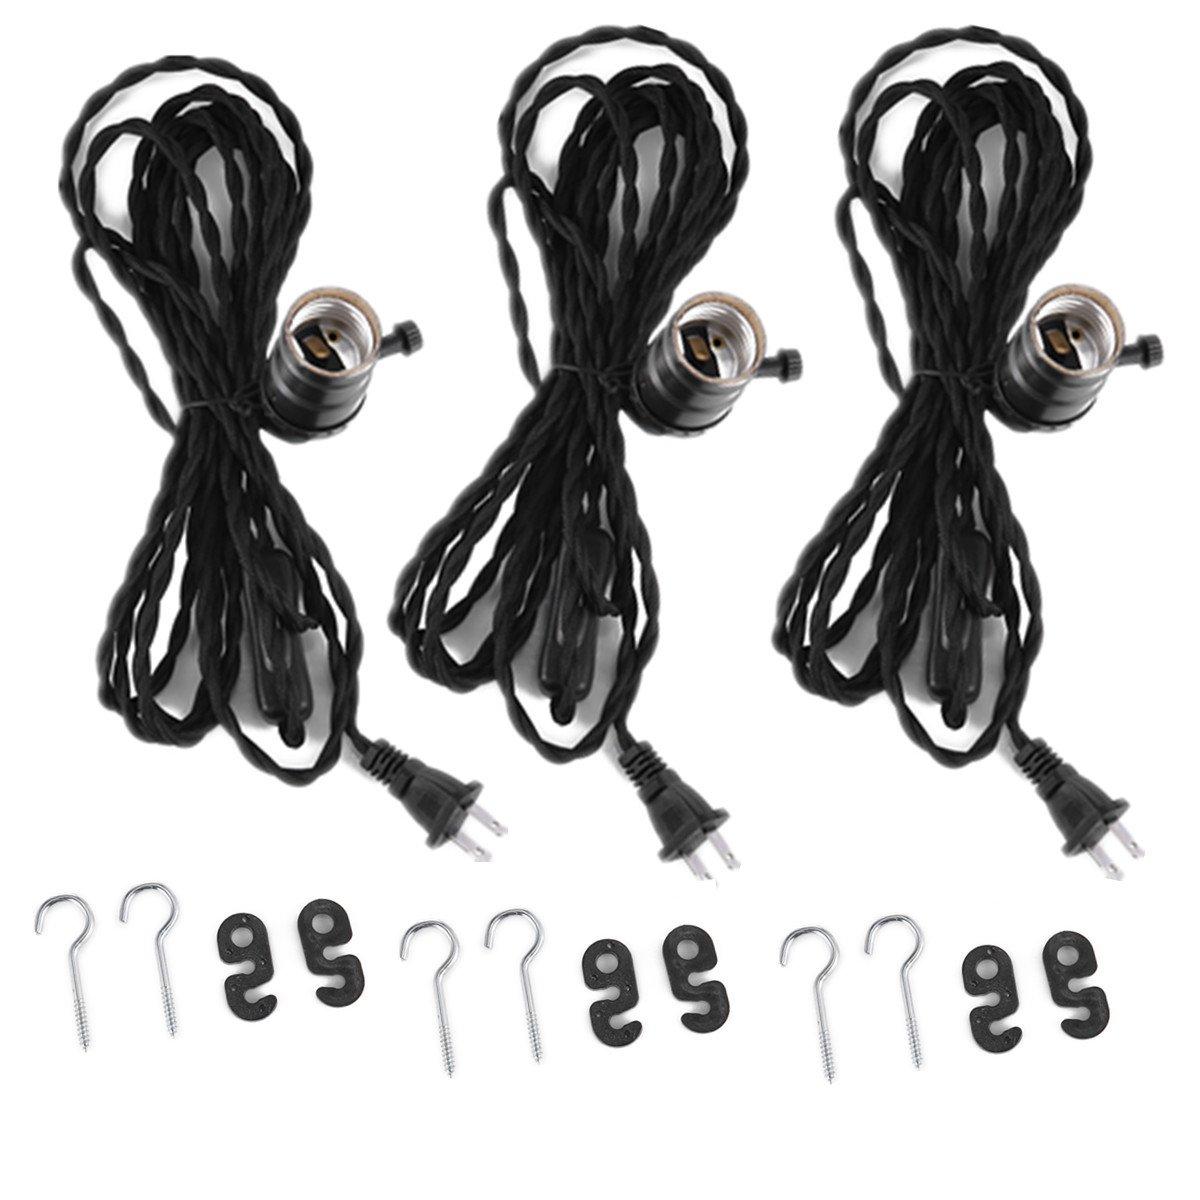 Cheap E26 Cord Lamp Socket Find Deals On Line Wiring Kits Get Quotations Fadimikoo E27 Vintage Edison Hanging Textile Pendant Light 147ft Kit